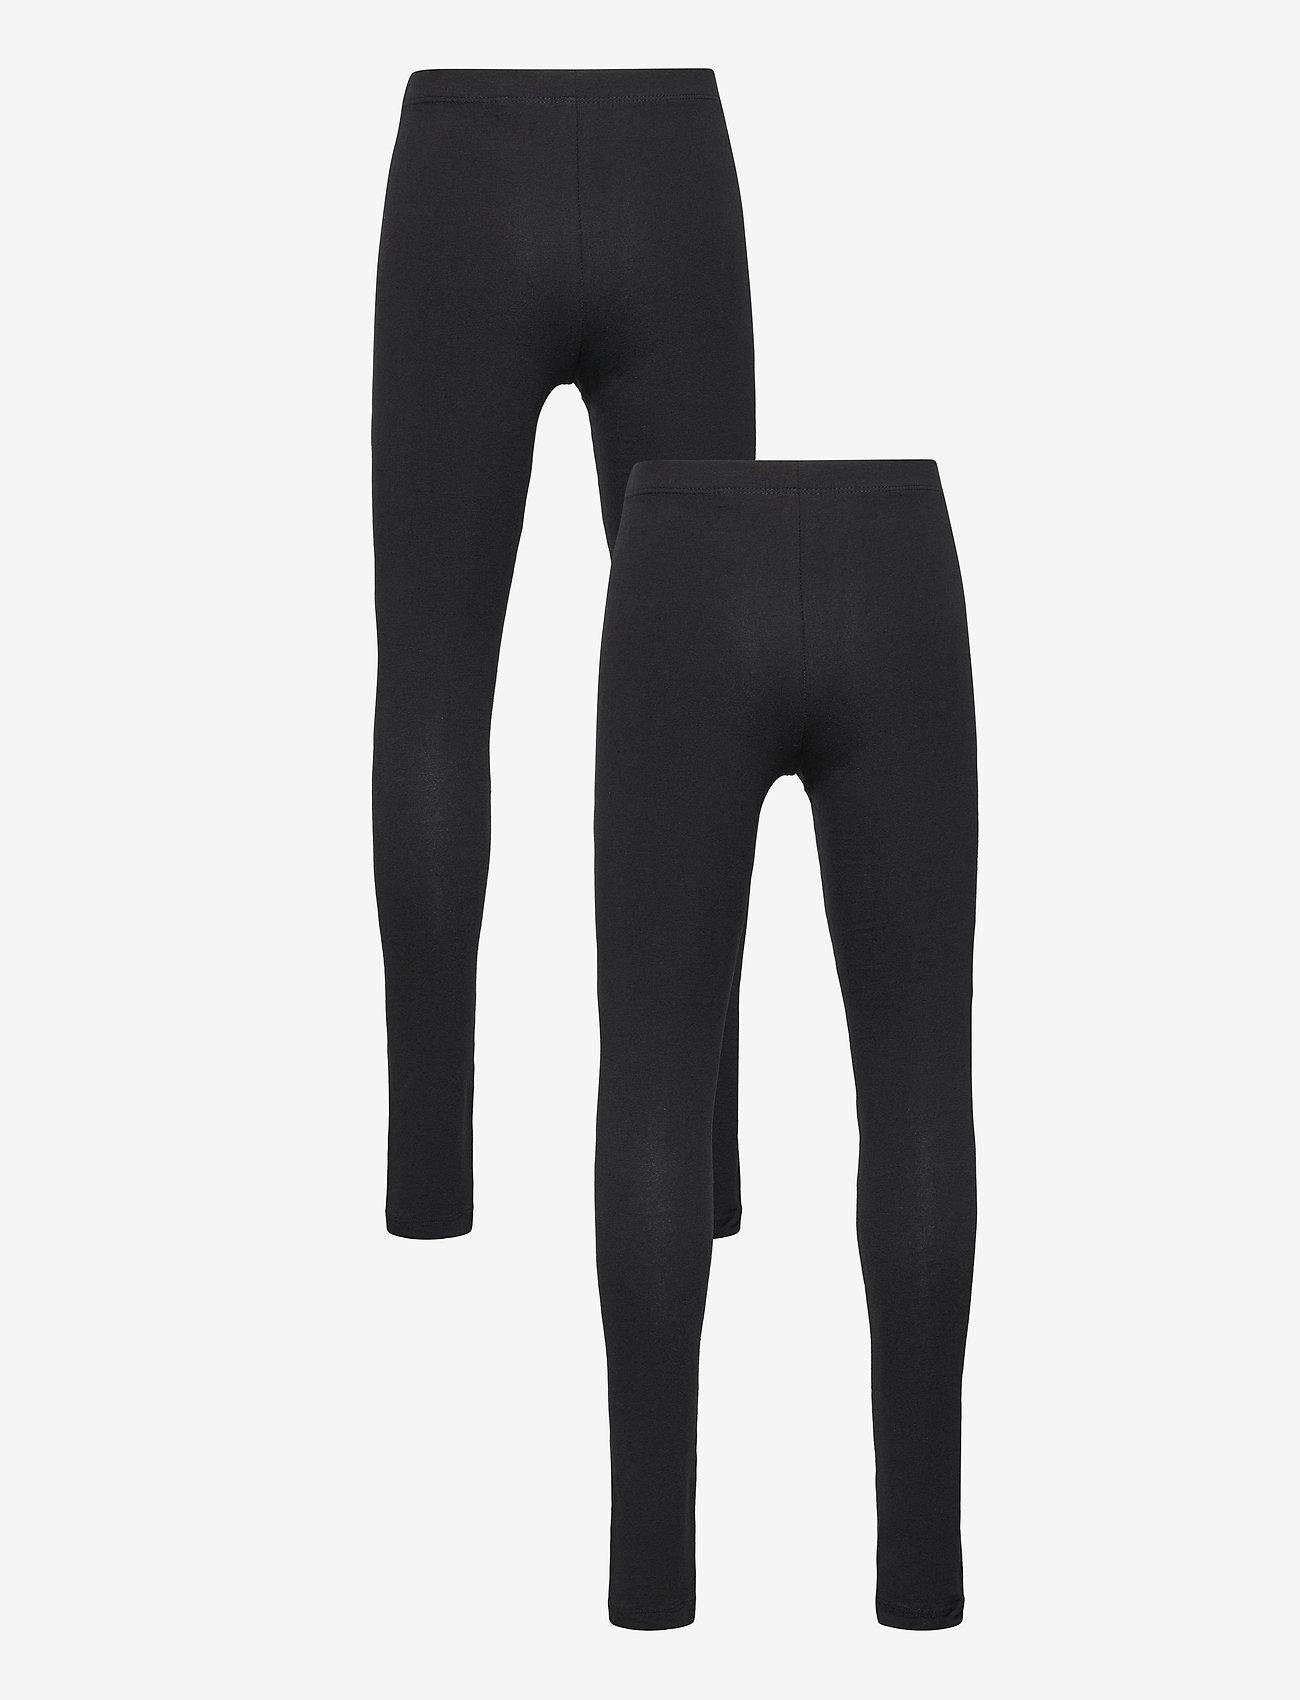 name it - NKFVIVIAN 2P LEGGING NOOS - leggings - black - 1